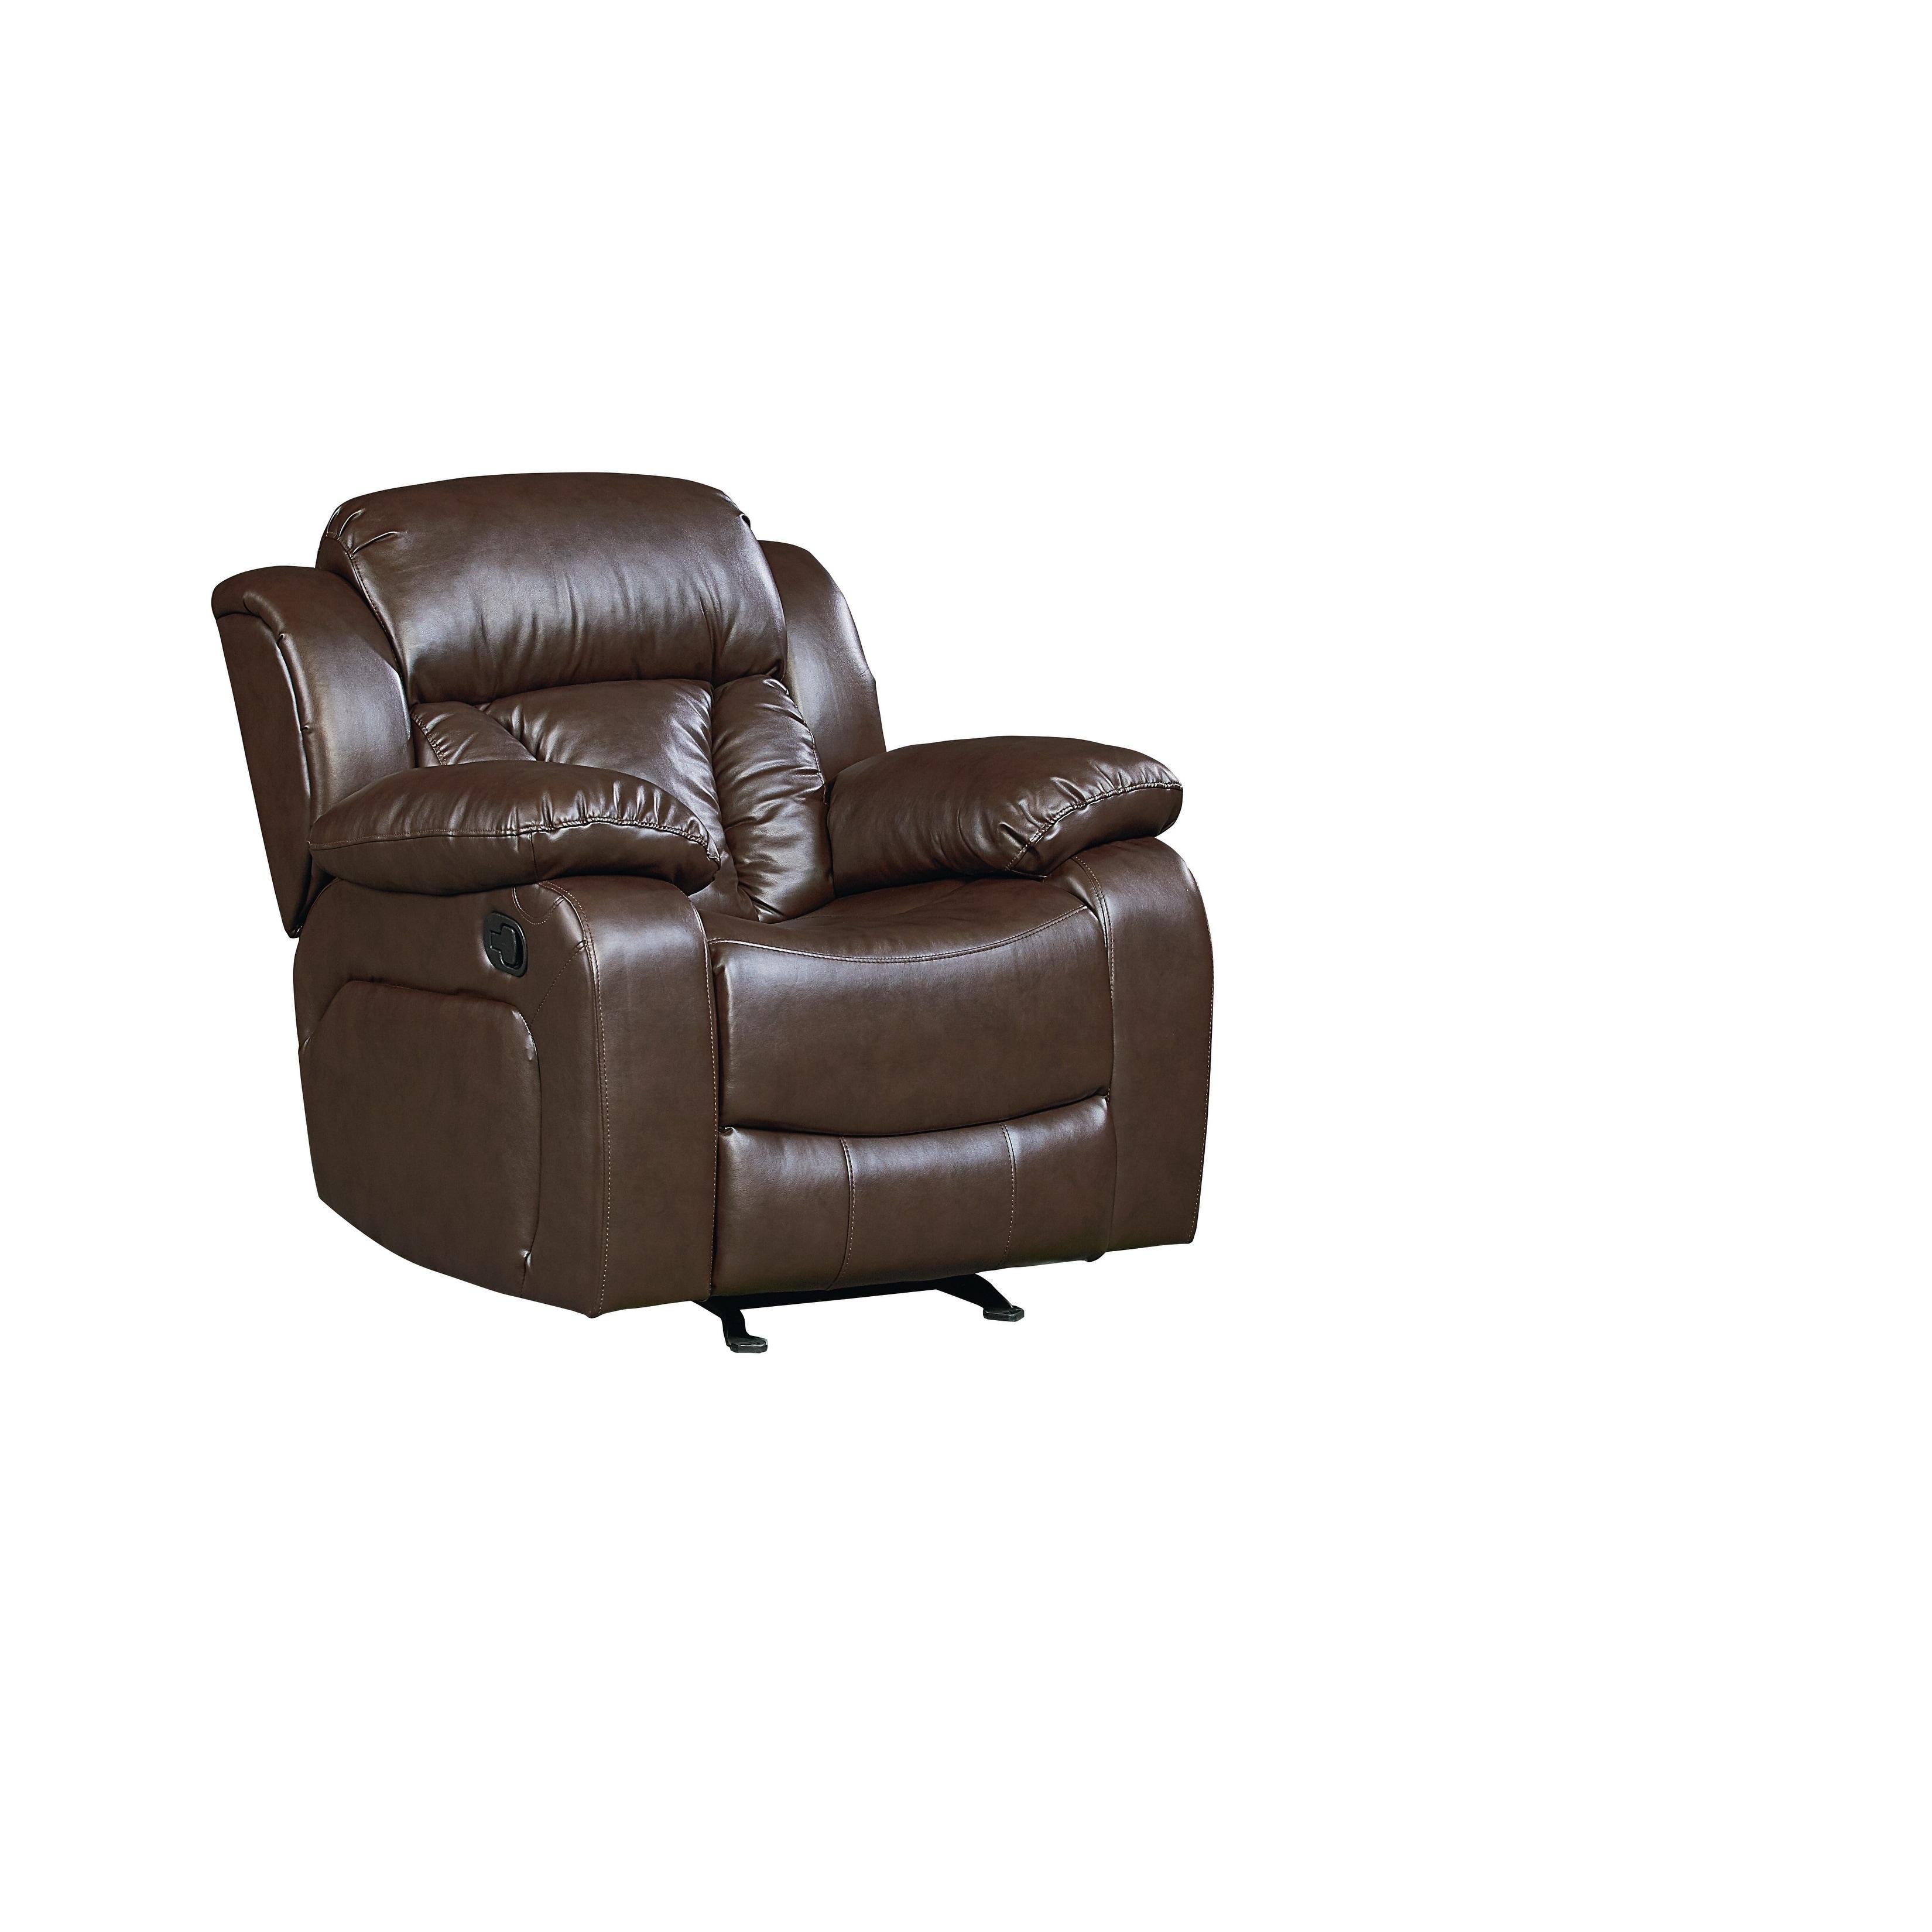 Standard Furniture Northshore Manual Motion Glider Recliner, Brown